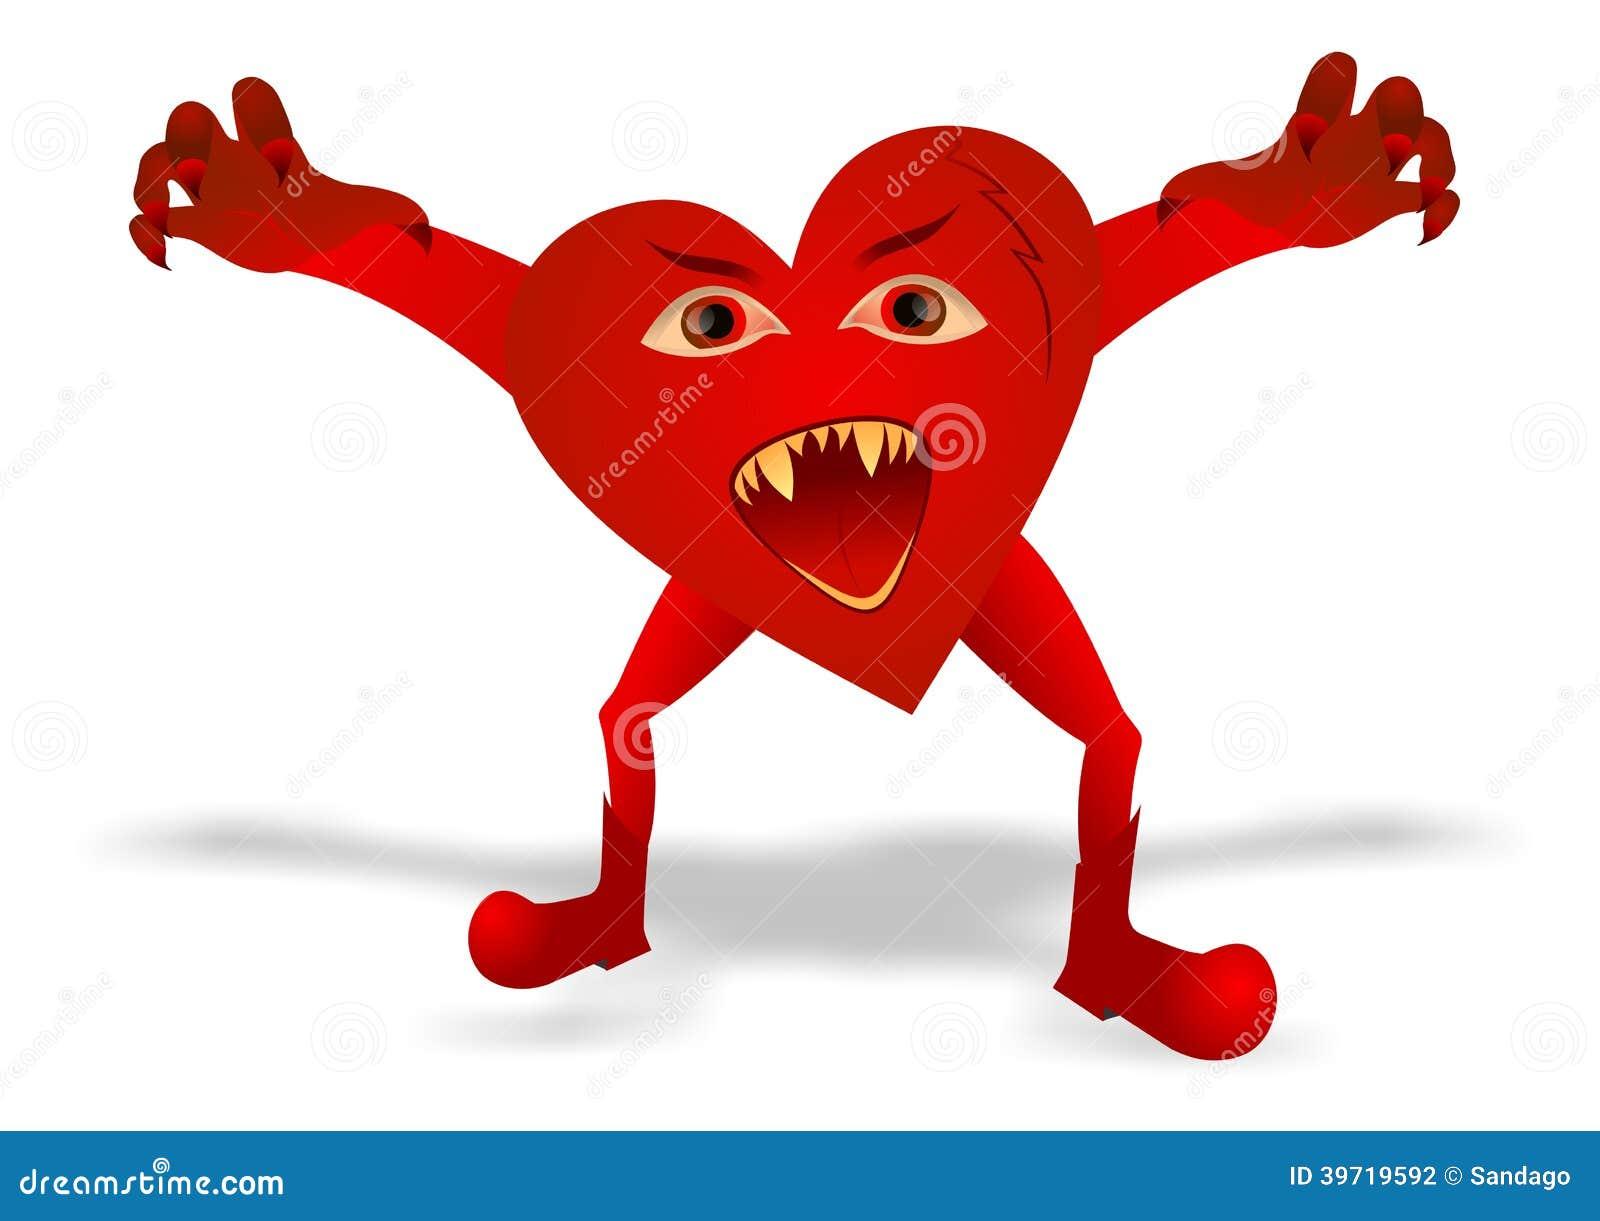 Evil heart stock vector. Illus...